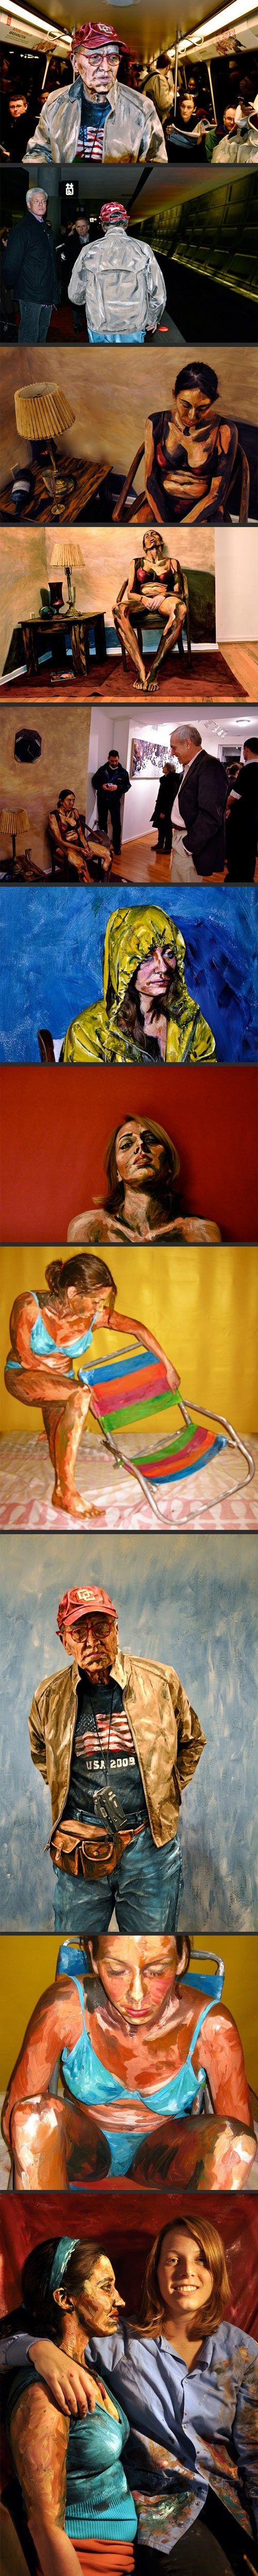 Hyper Realistic Acrylic Body Painting ~ Alexa Meade